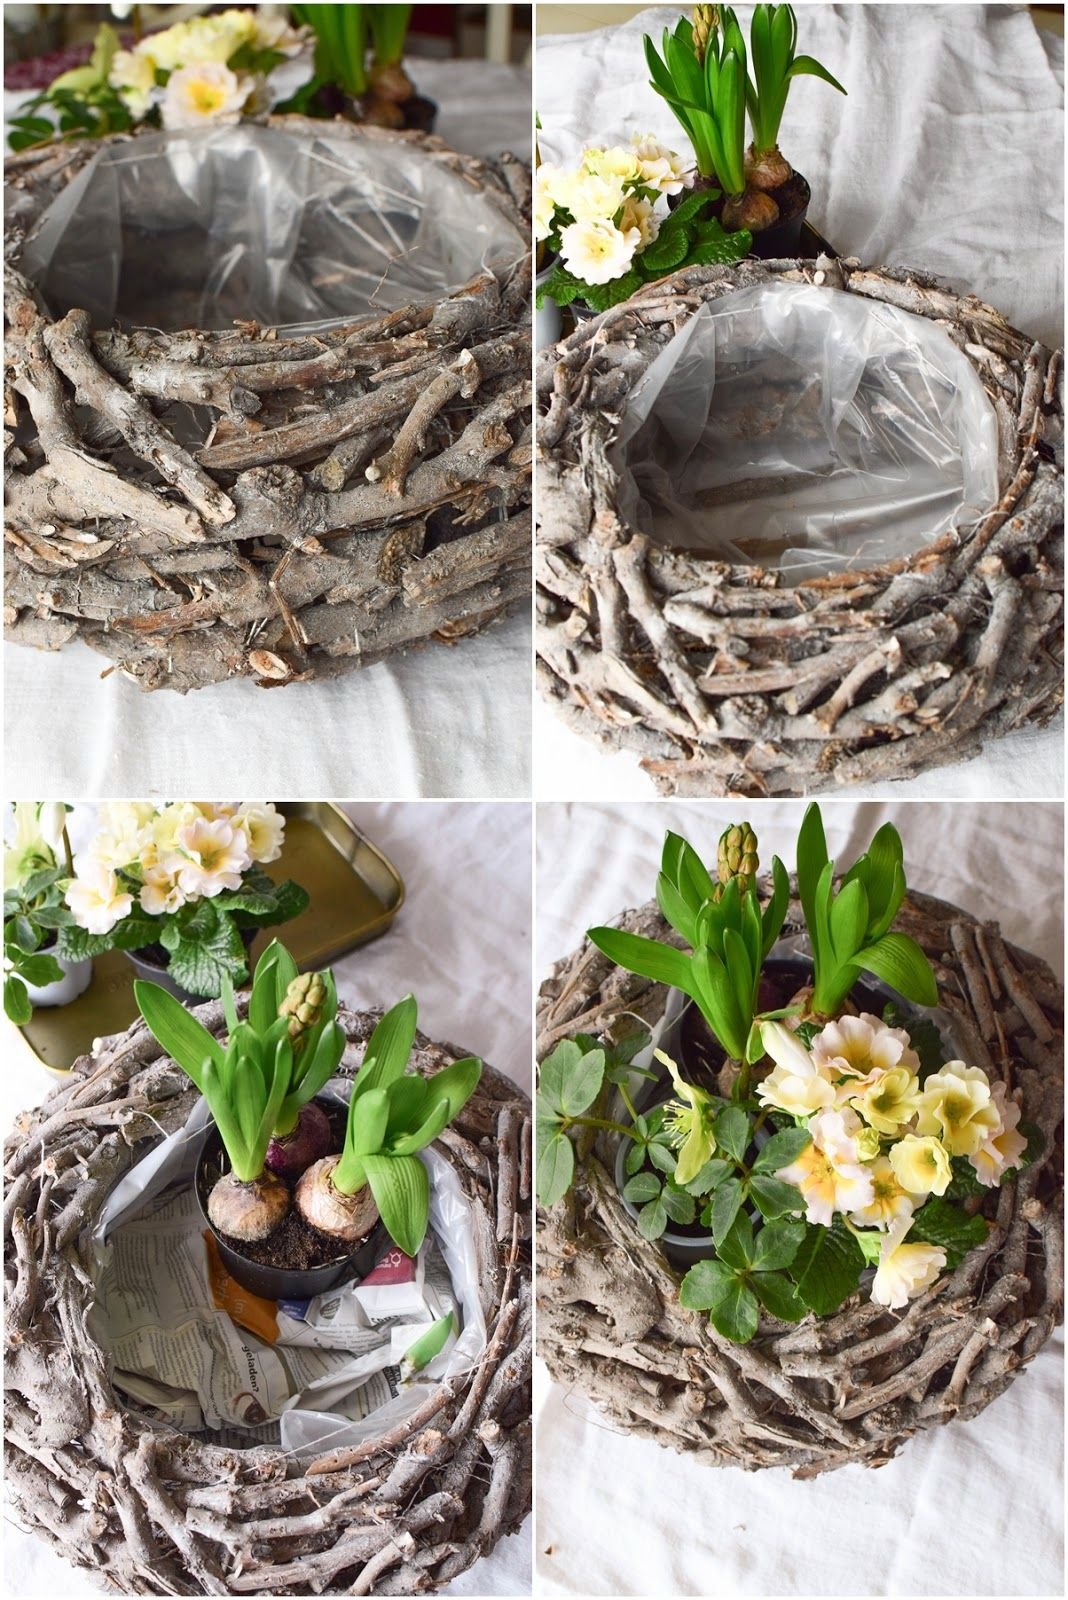 Diy Fruhlingskorb Naturlich Dekoriert Easter Spring And Gardens